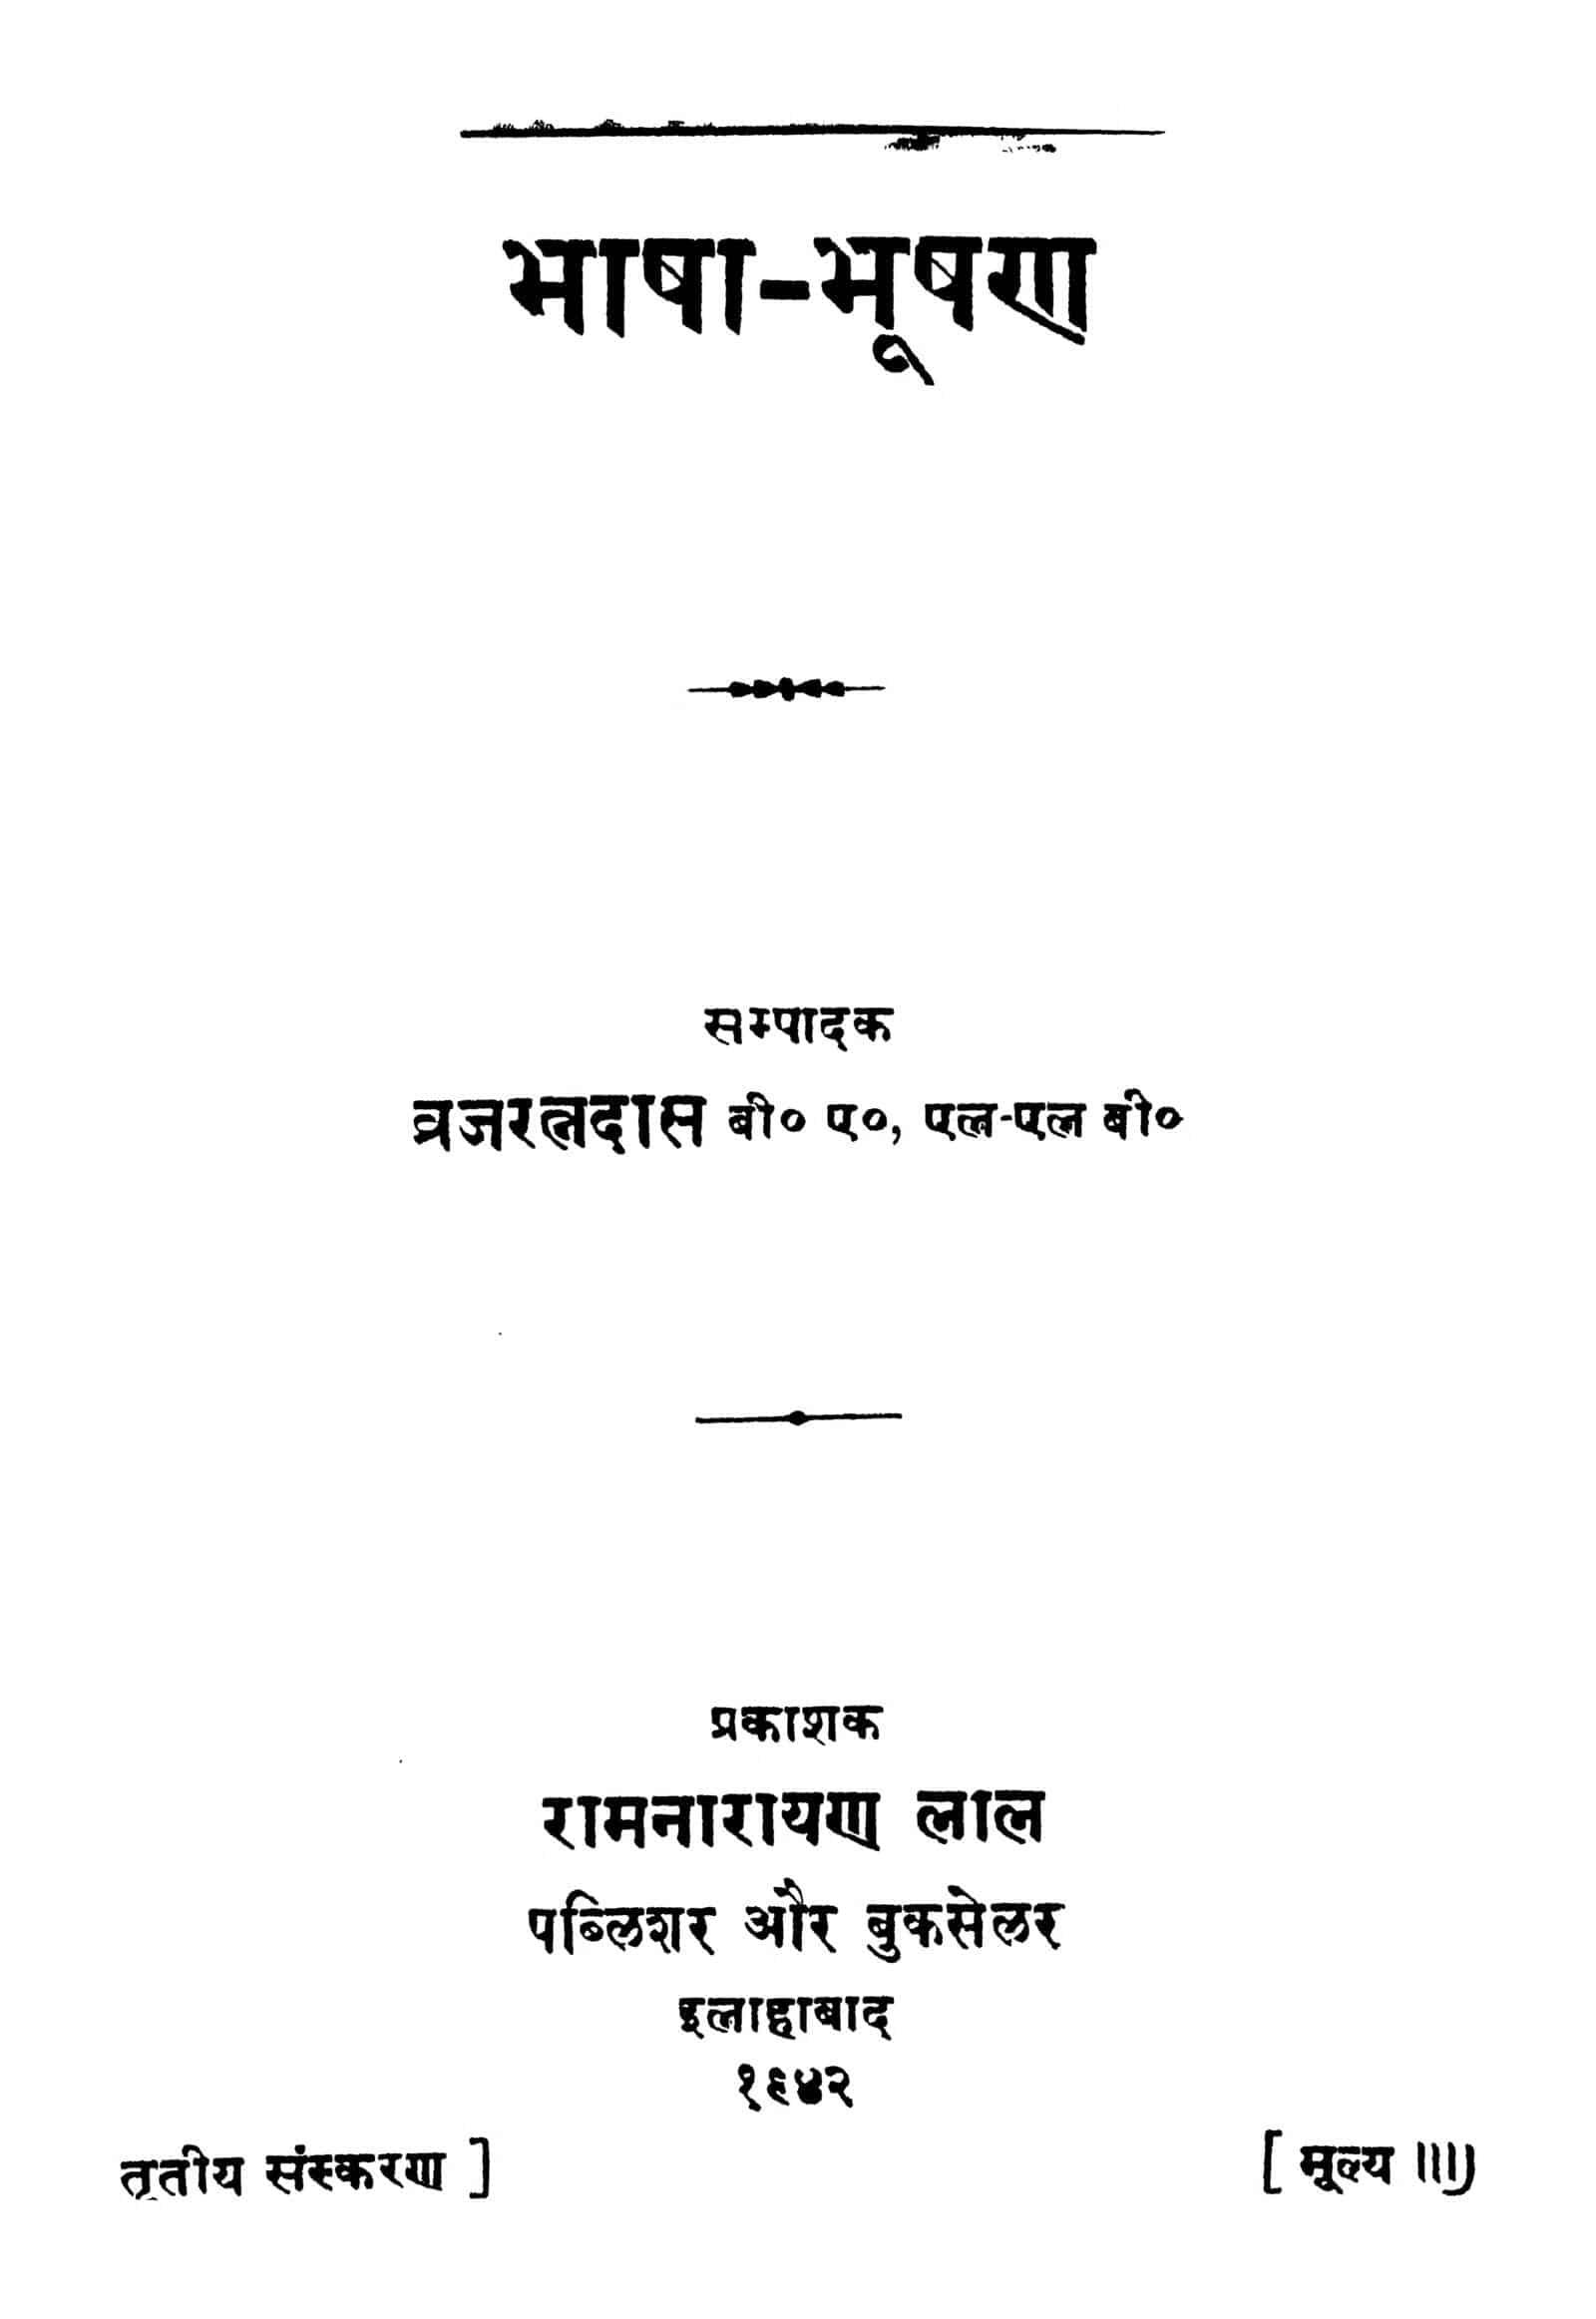 Book Image : भाषा - भूषण - Bhasha - Bhushan